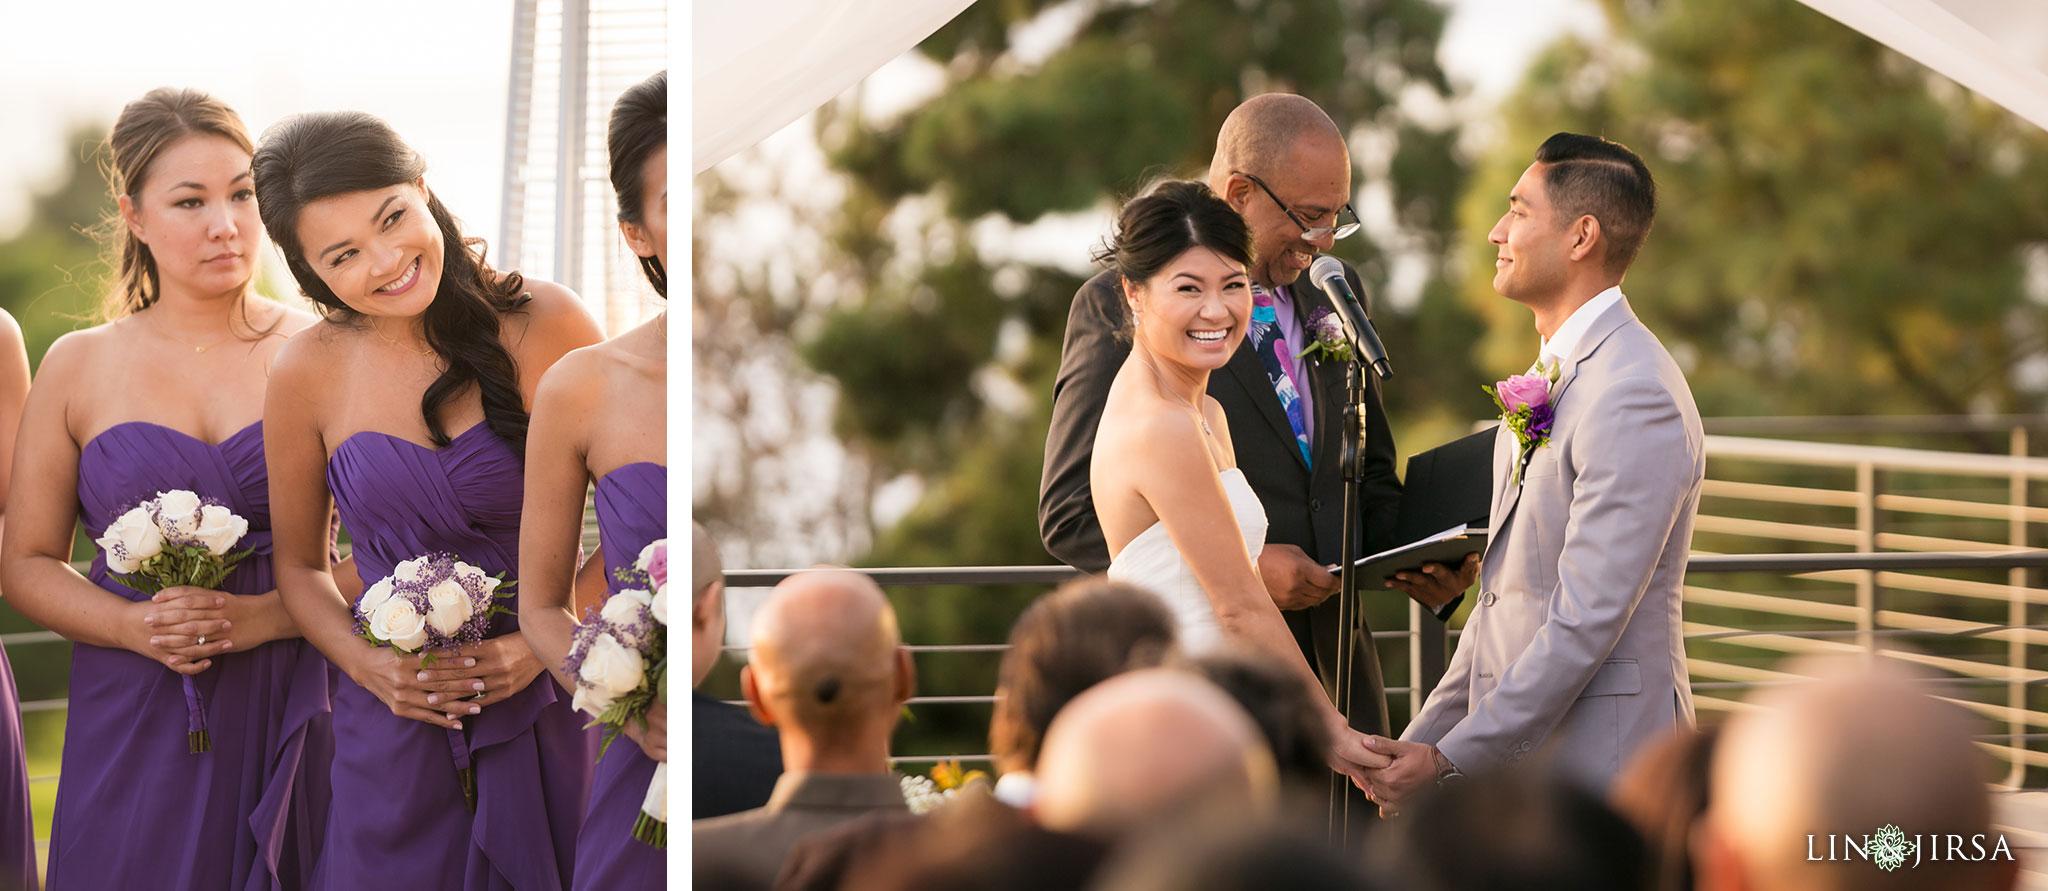 20 los verdes golf course wedding photography